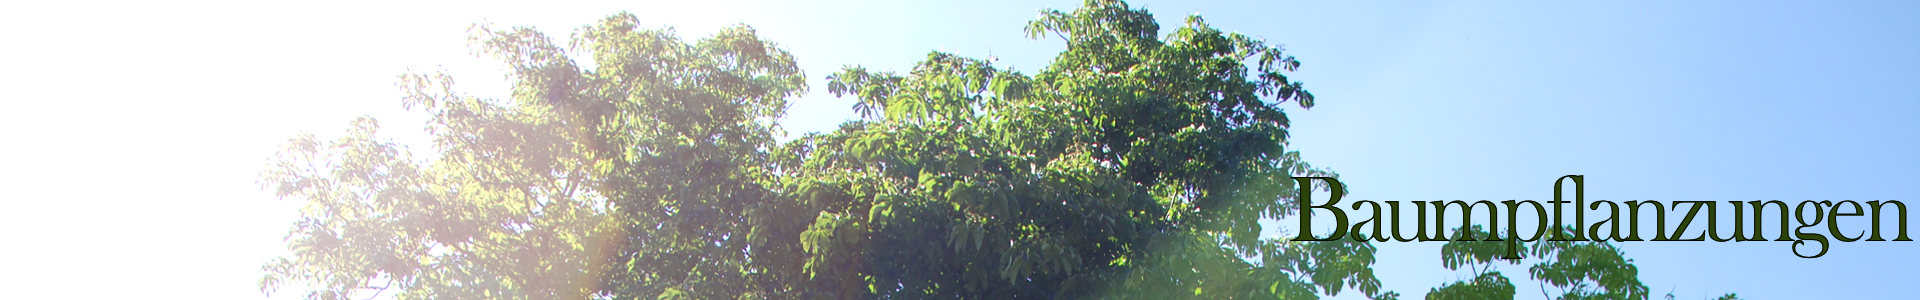 Header_Baumpflanzungen2